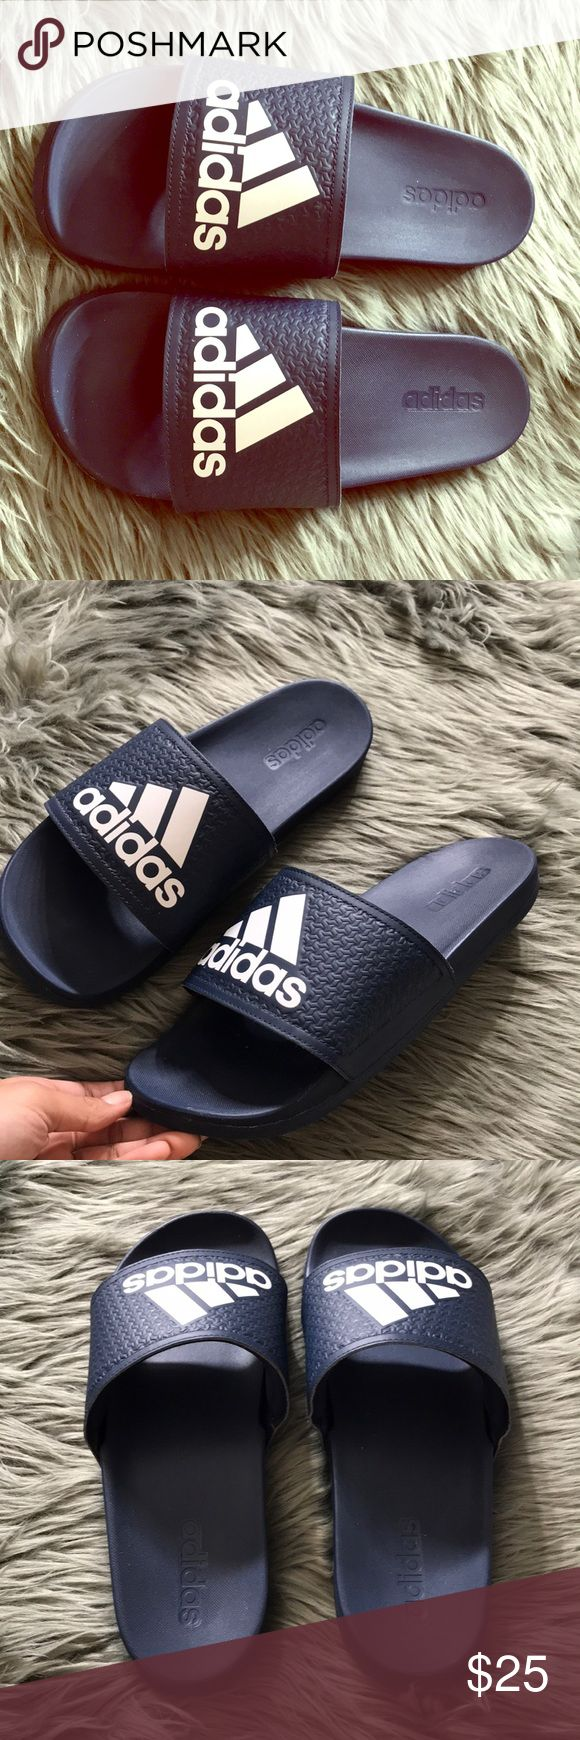 Adidas Sandals Navy blue original adidas sandals adidas Shoes Sandals